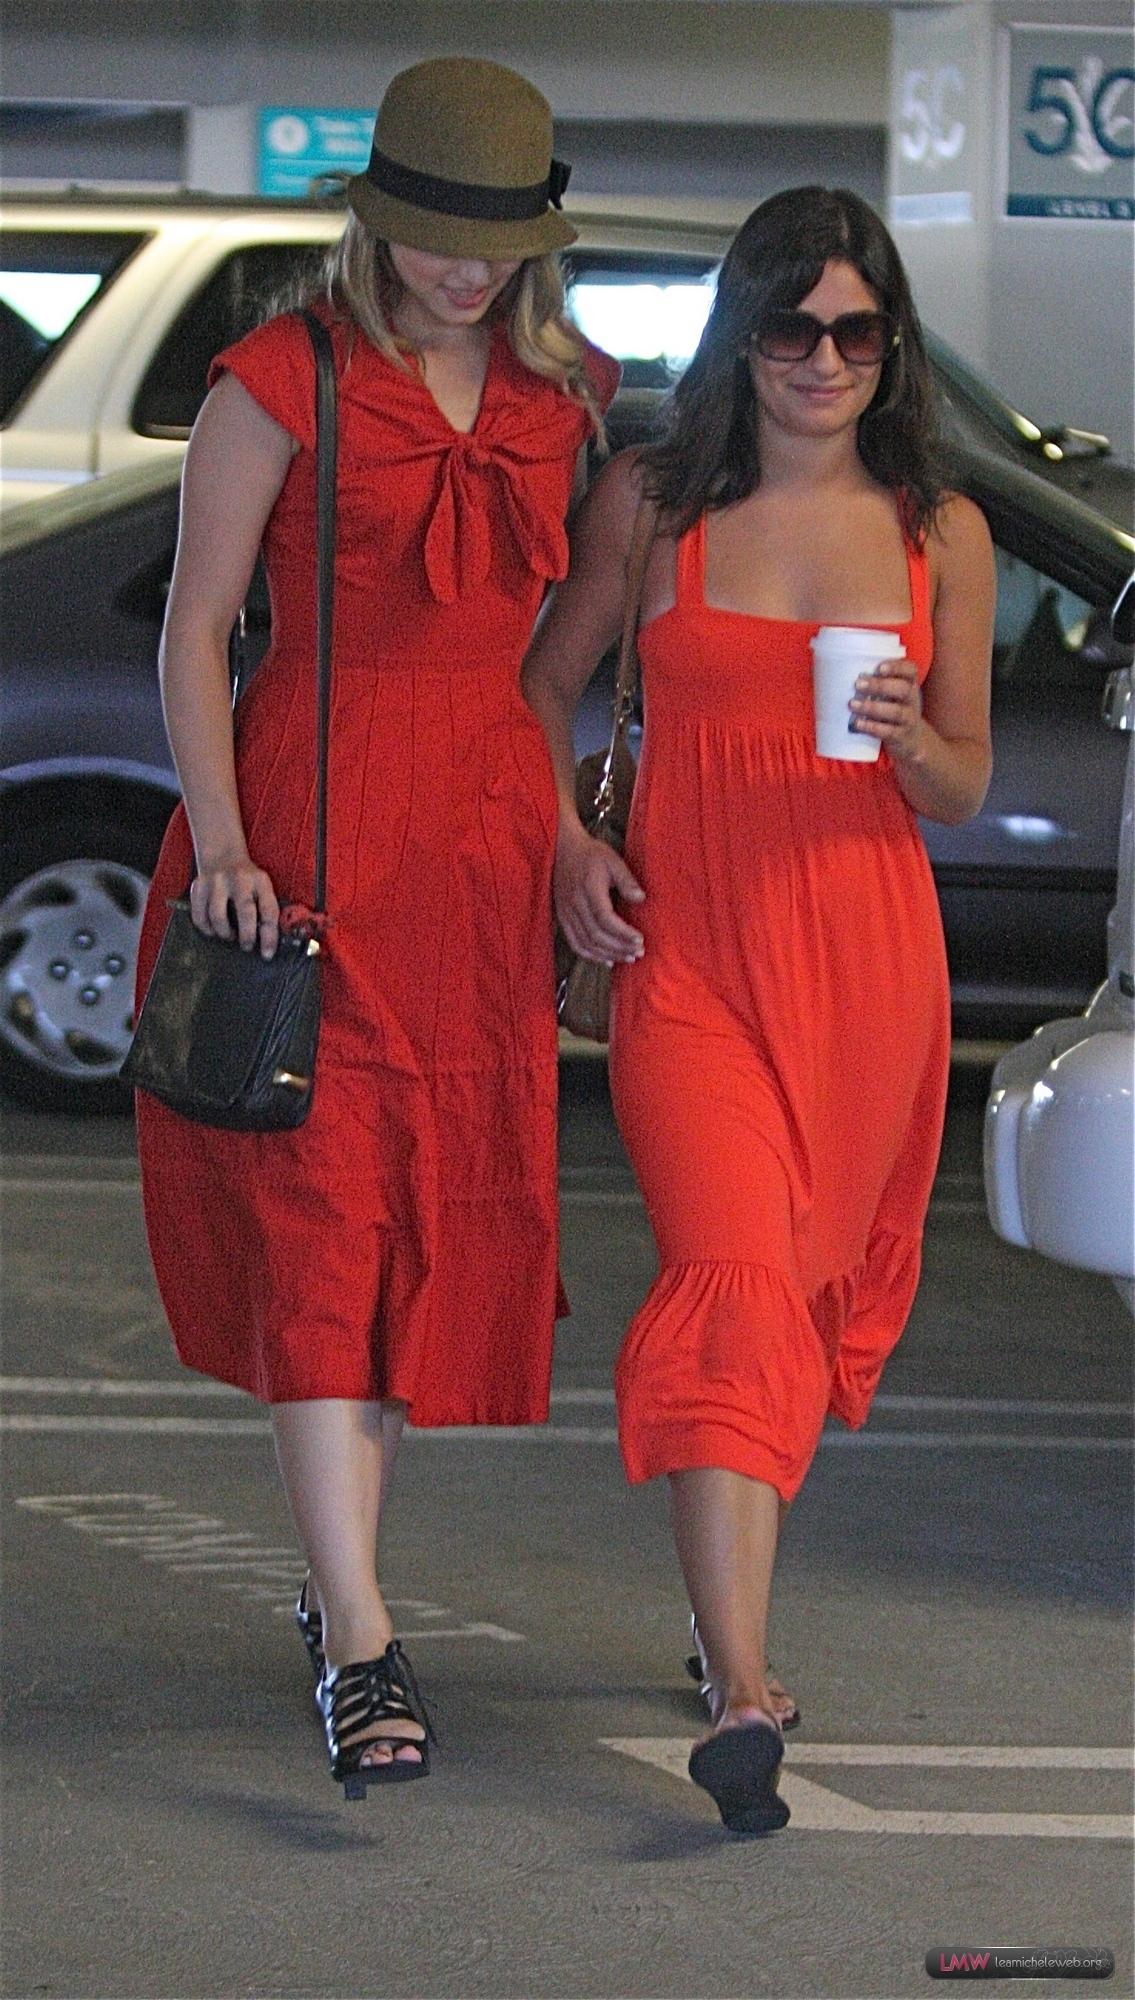 Dianna and Lea *BFF*